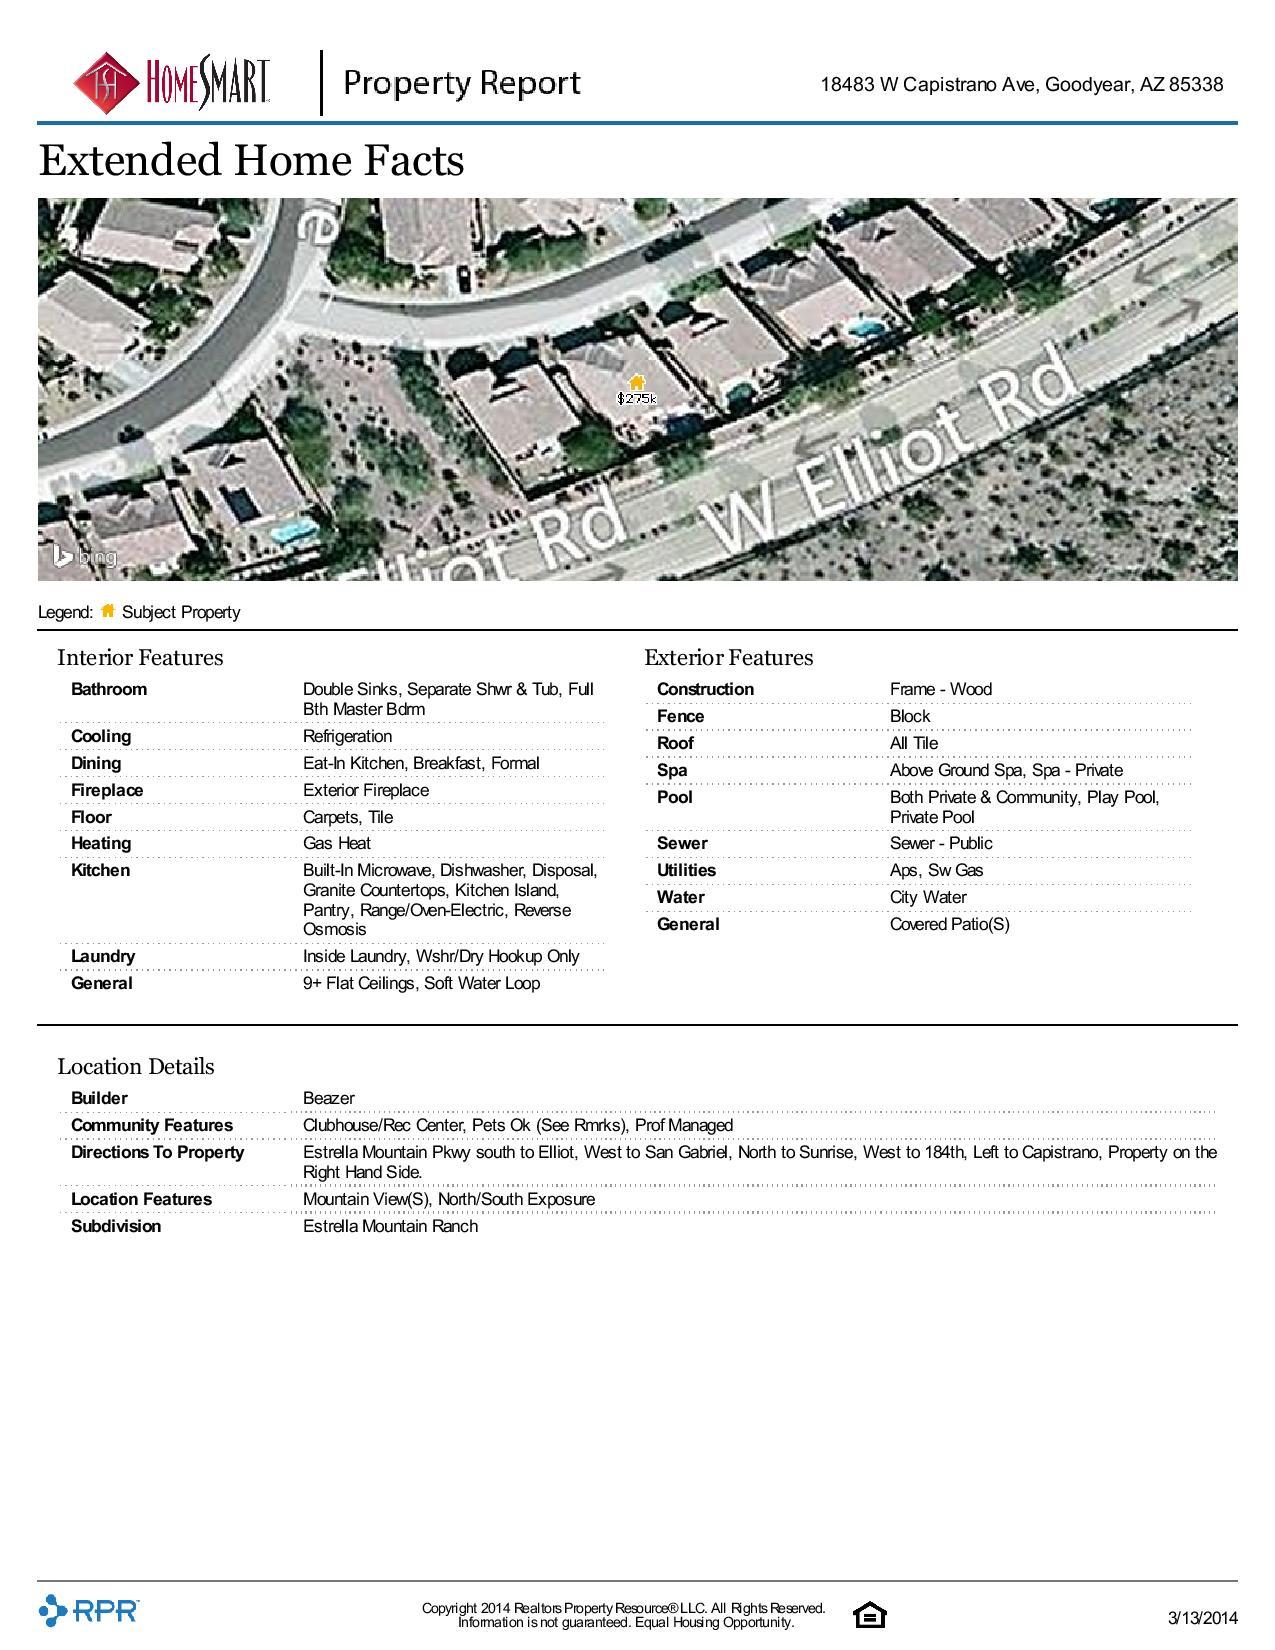 18483-W-Capistrano-Ave-Goodyear-AZ-85338-page-004